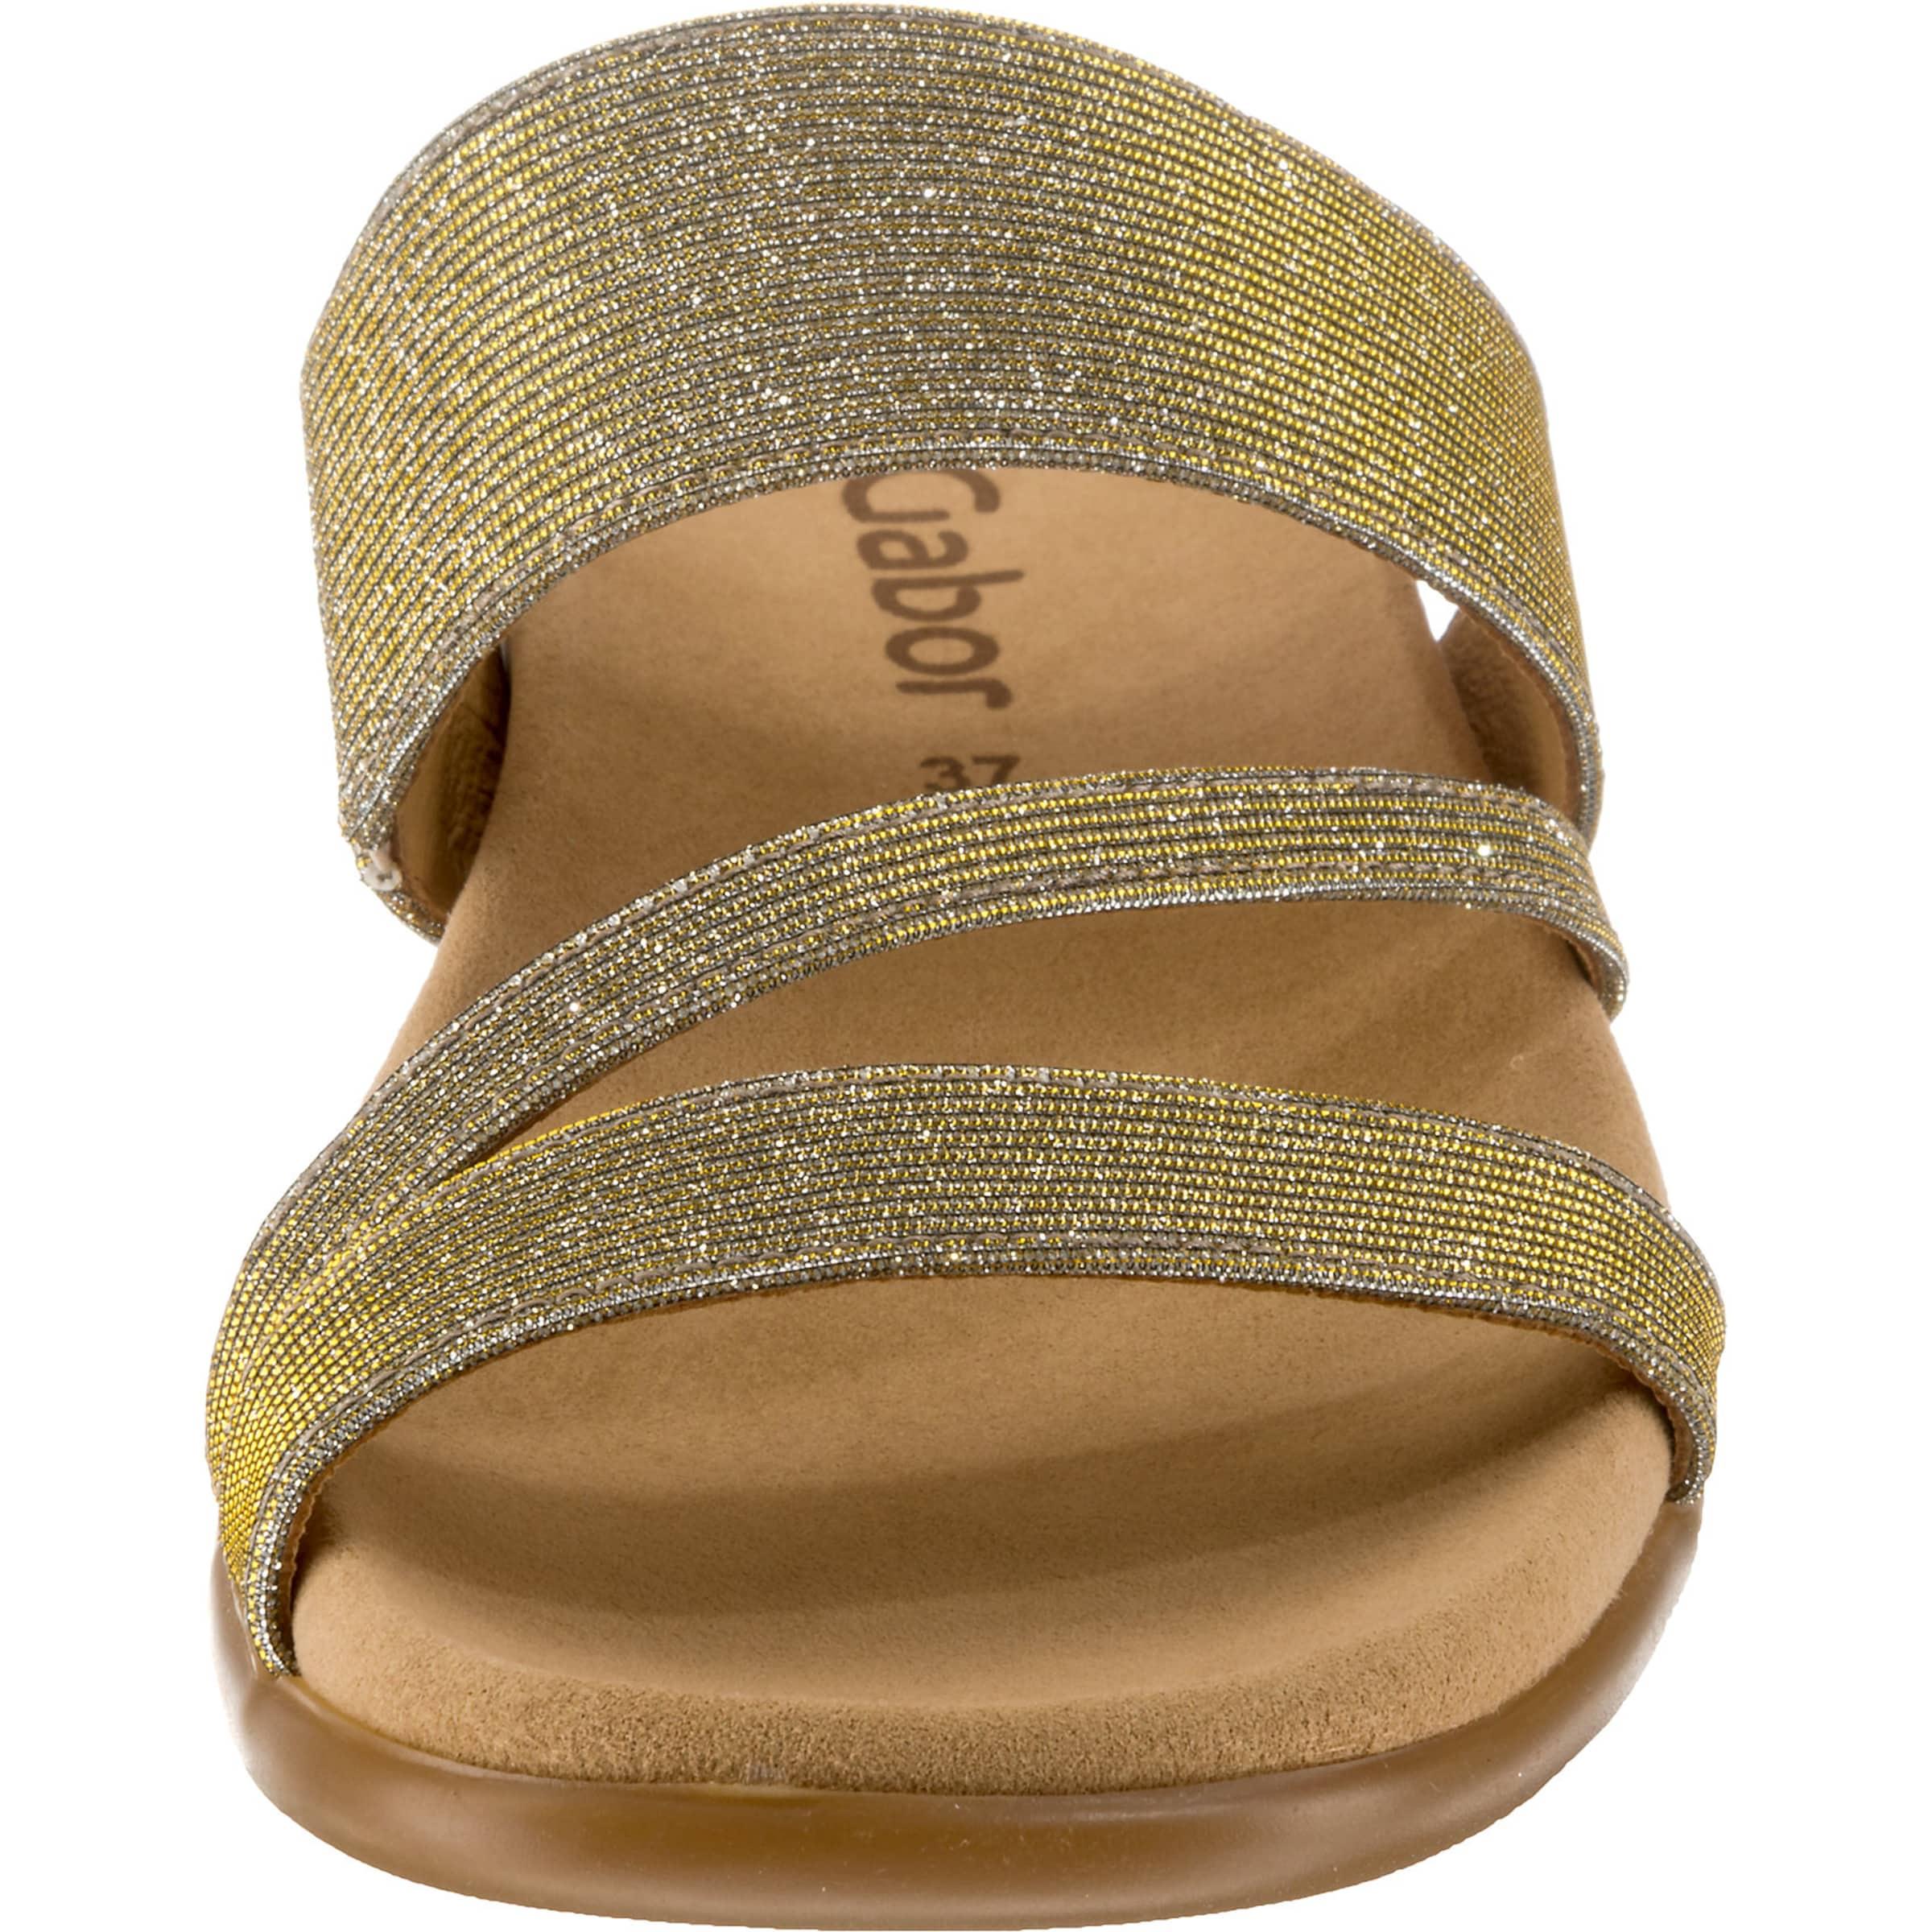 GoldKhaki Pantolette Pantolette Gabor In Gabor GoldKhaki Gabor Pantolette In In GoldKhaki Gabor Pantolette In bfg76Yyv